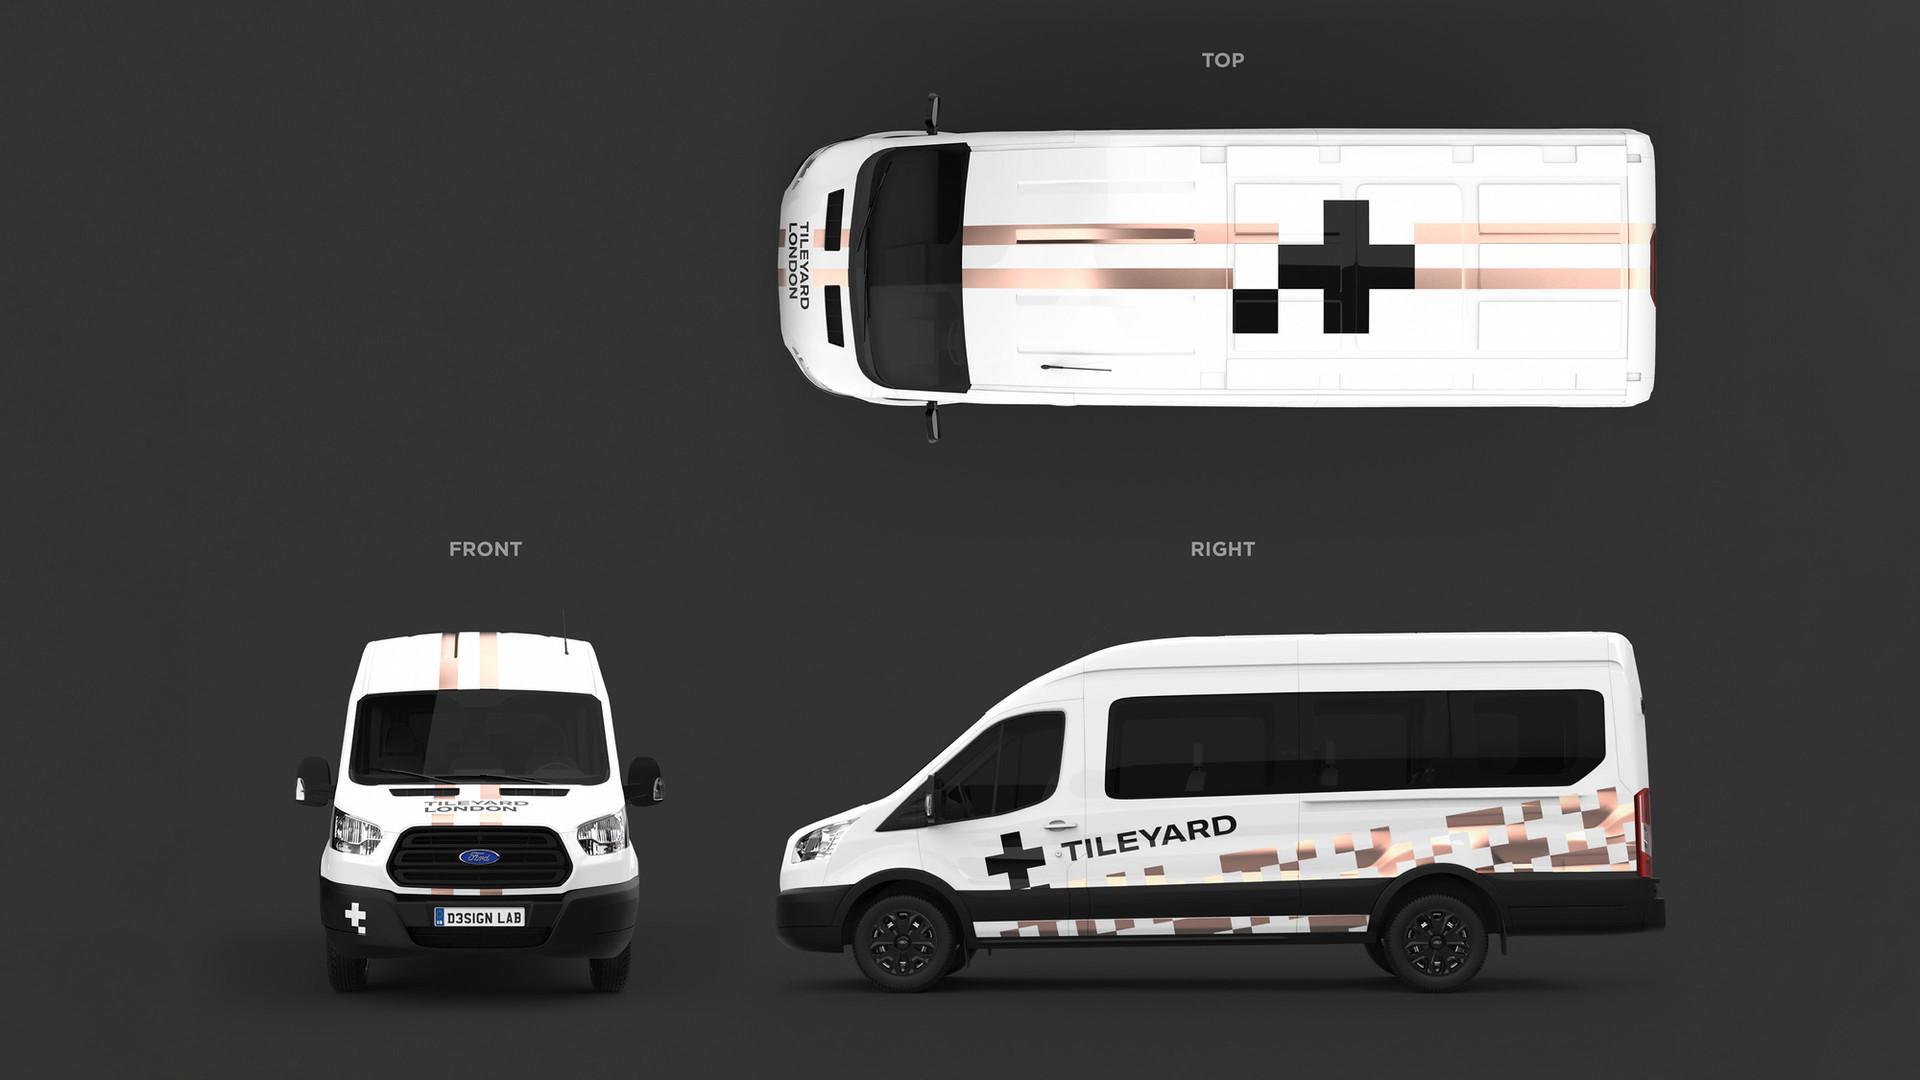 Tileyard Car - _0009_Van Projection.jpg